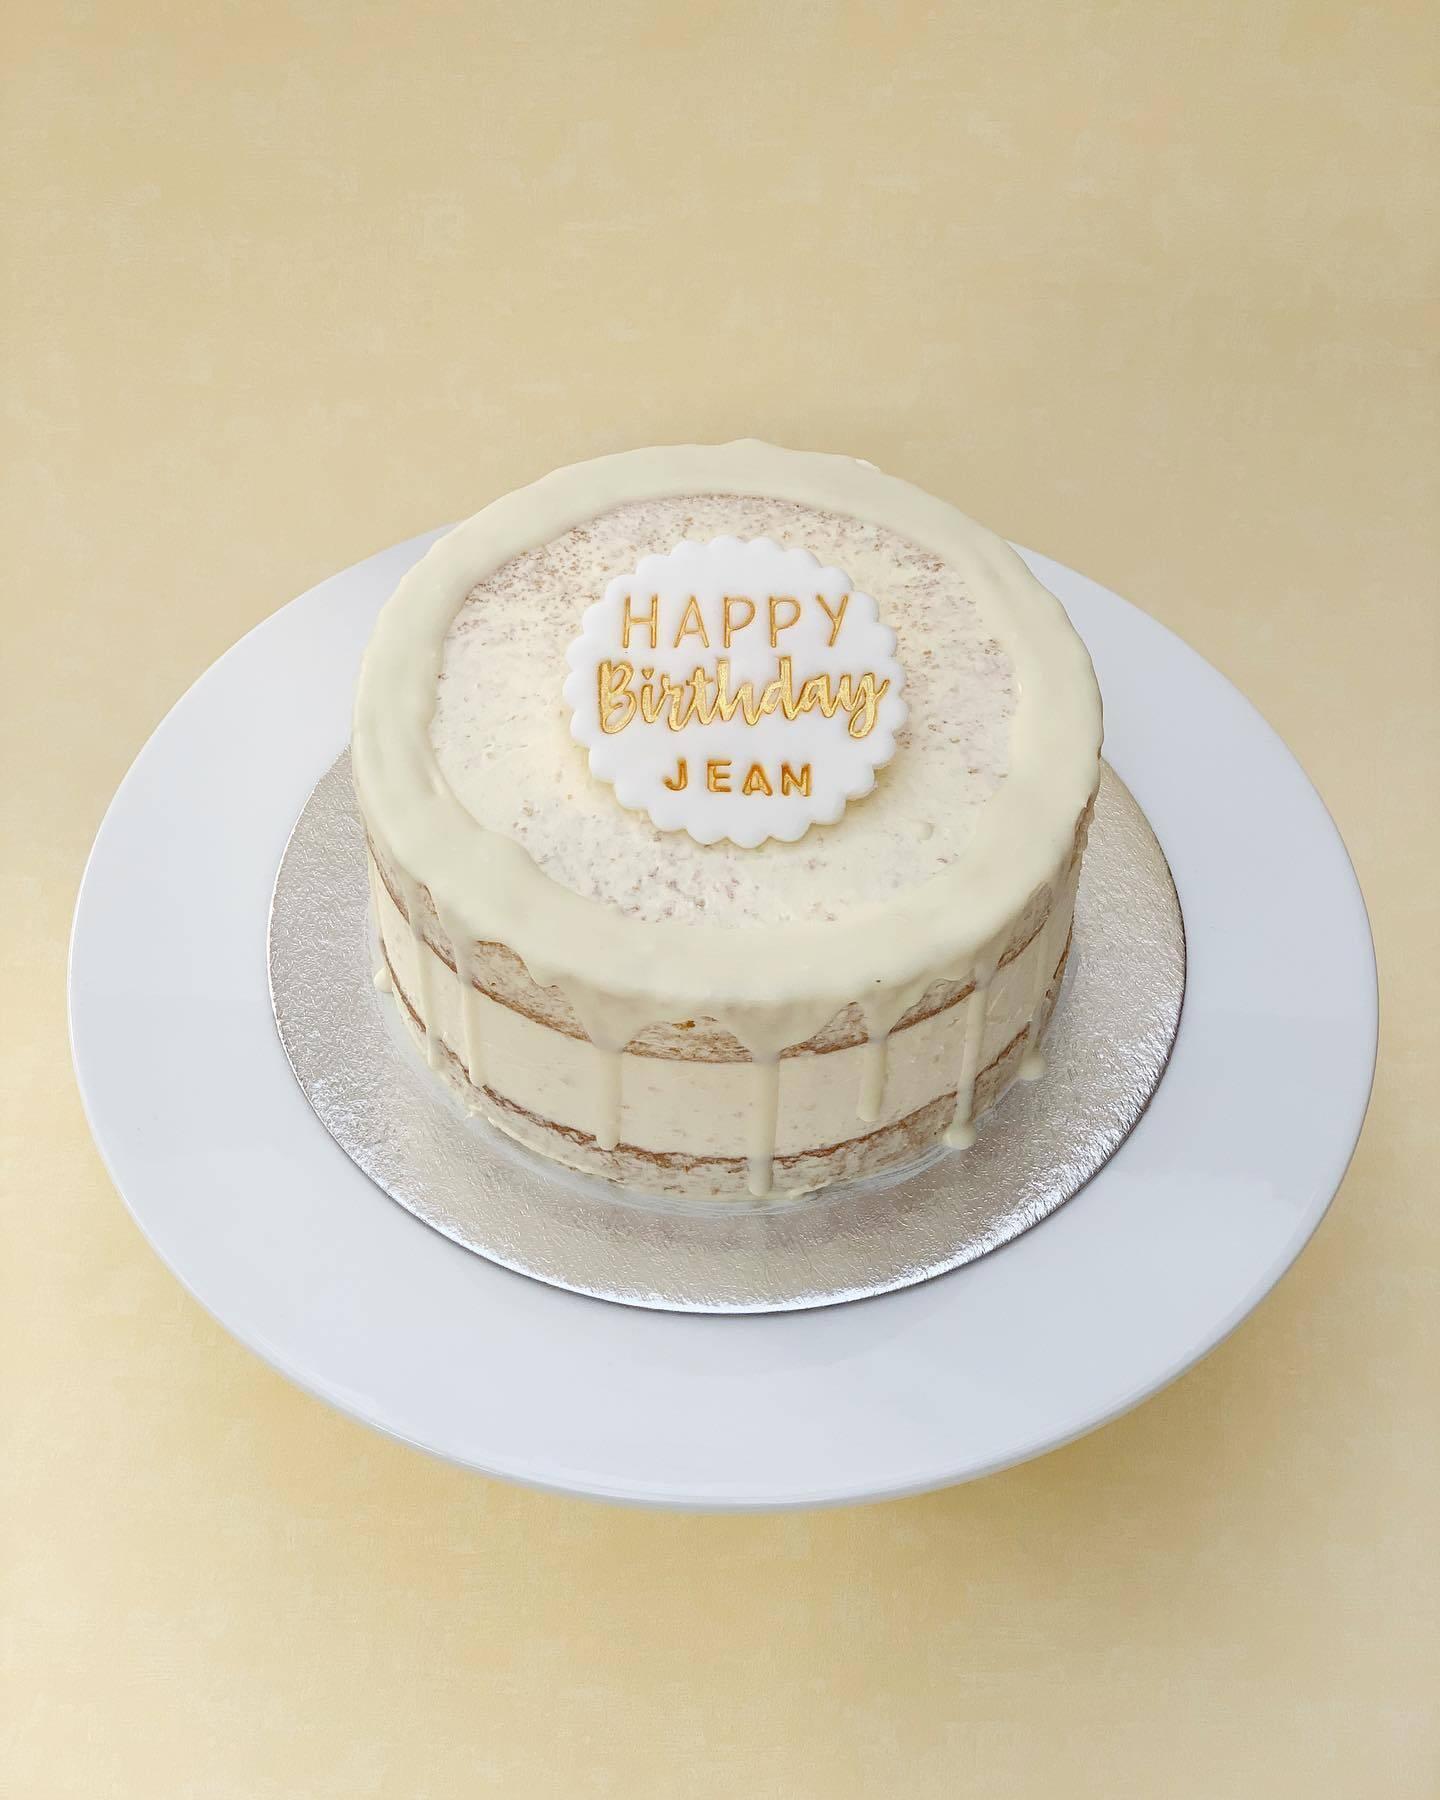 Lemon Cake with White Chocolate